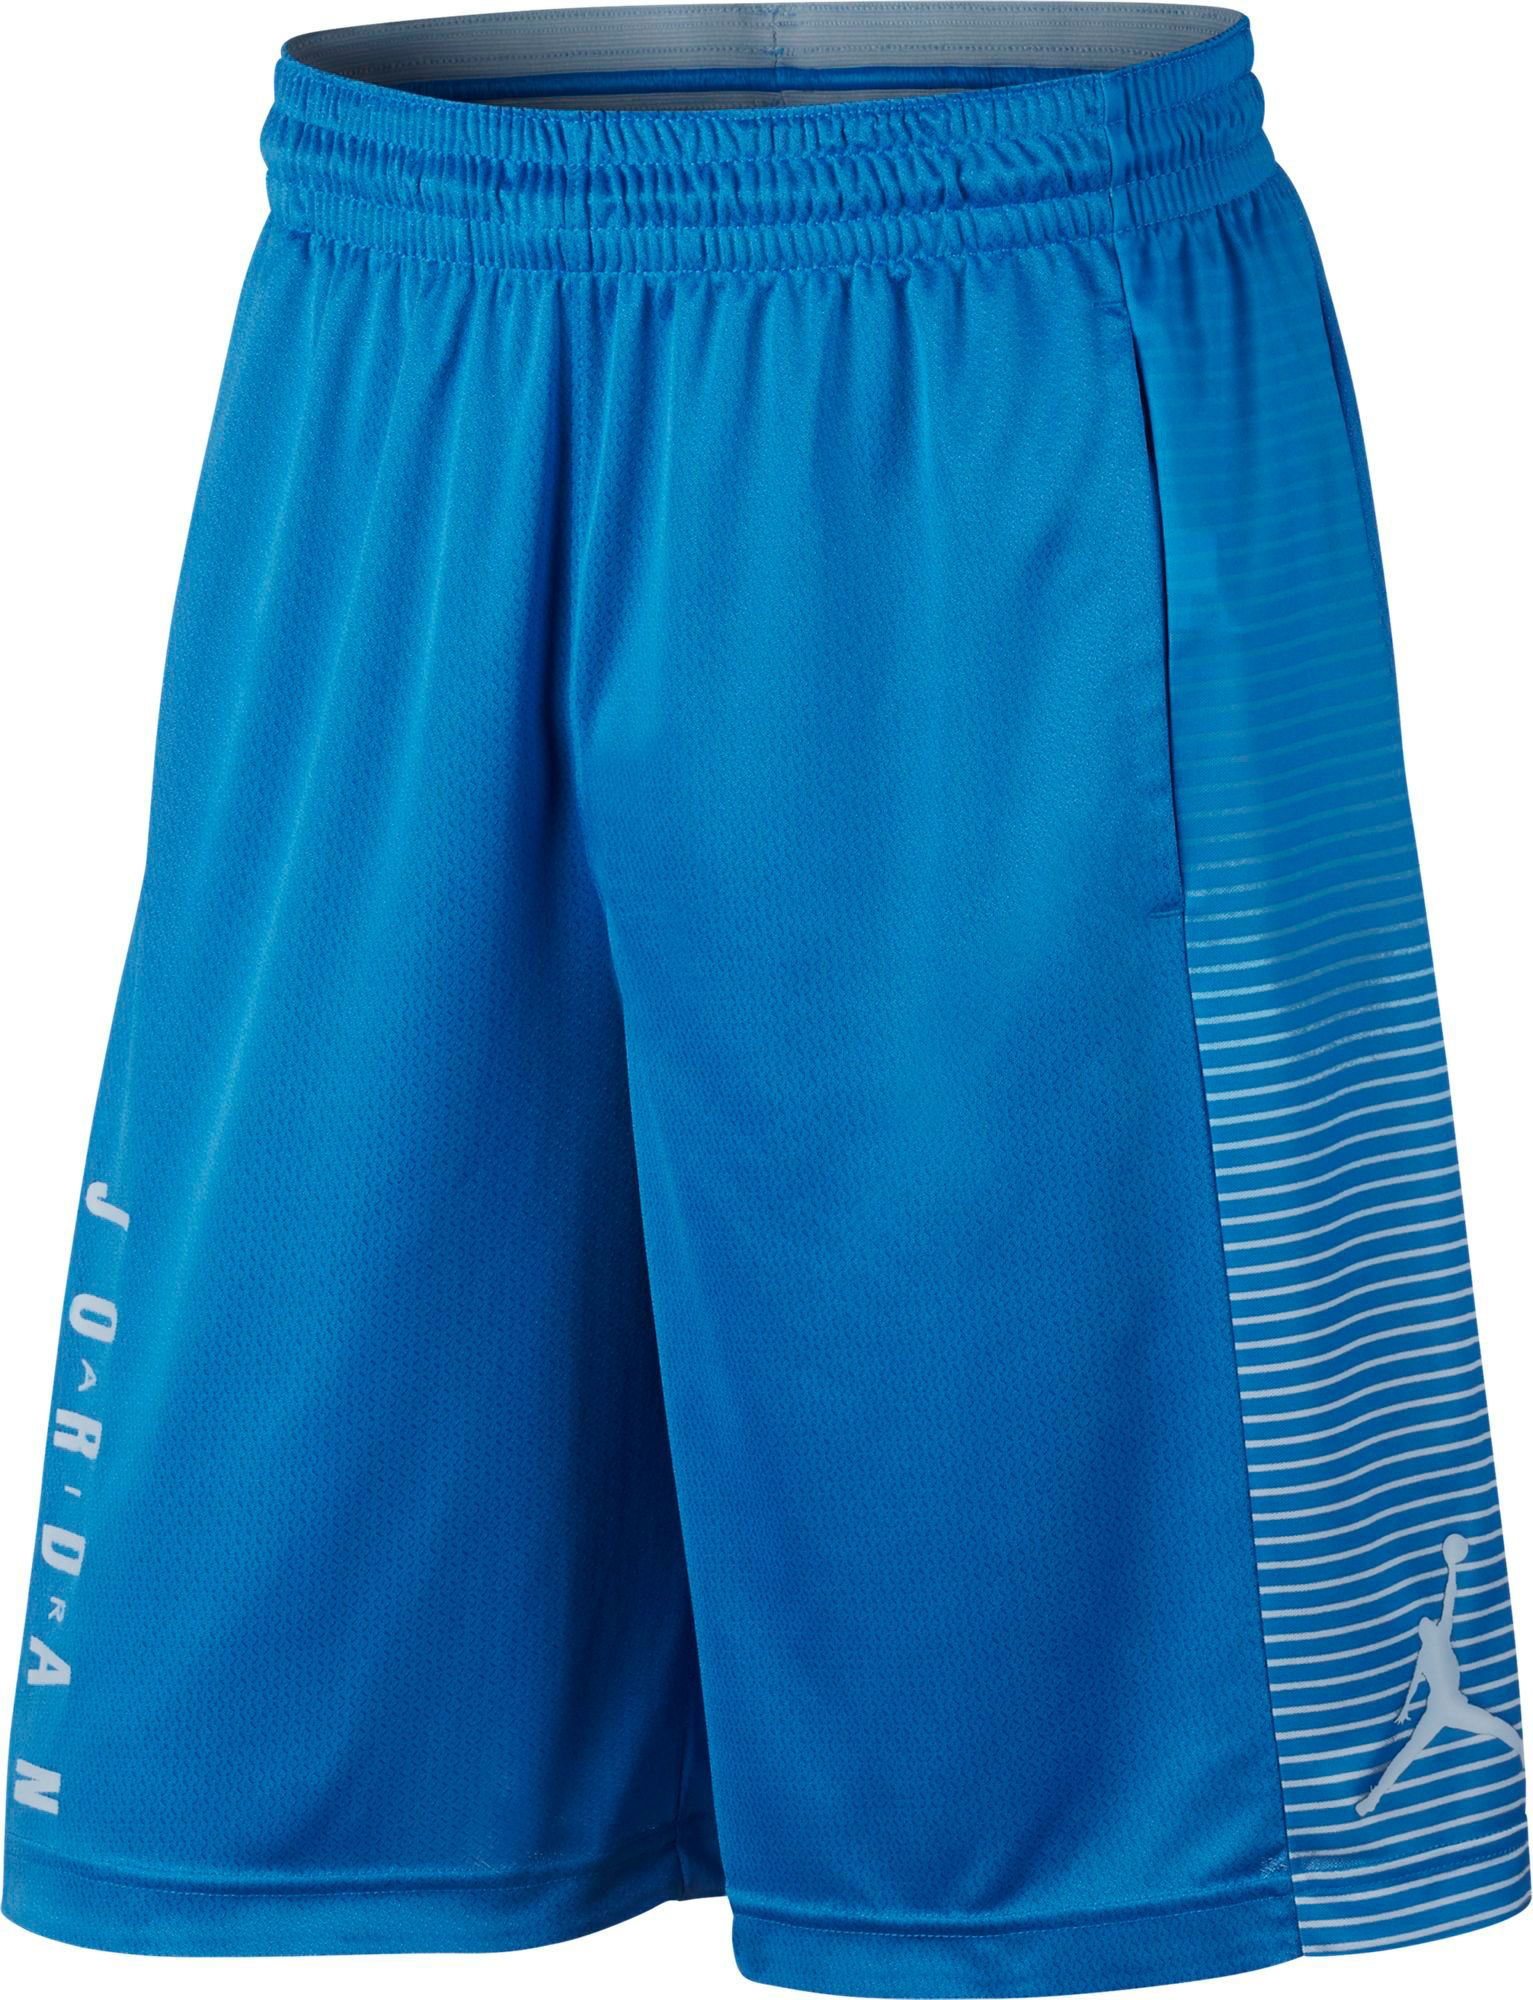 air jordan basketball apparel